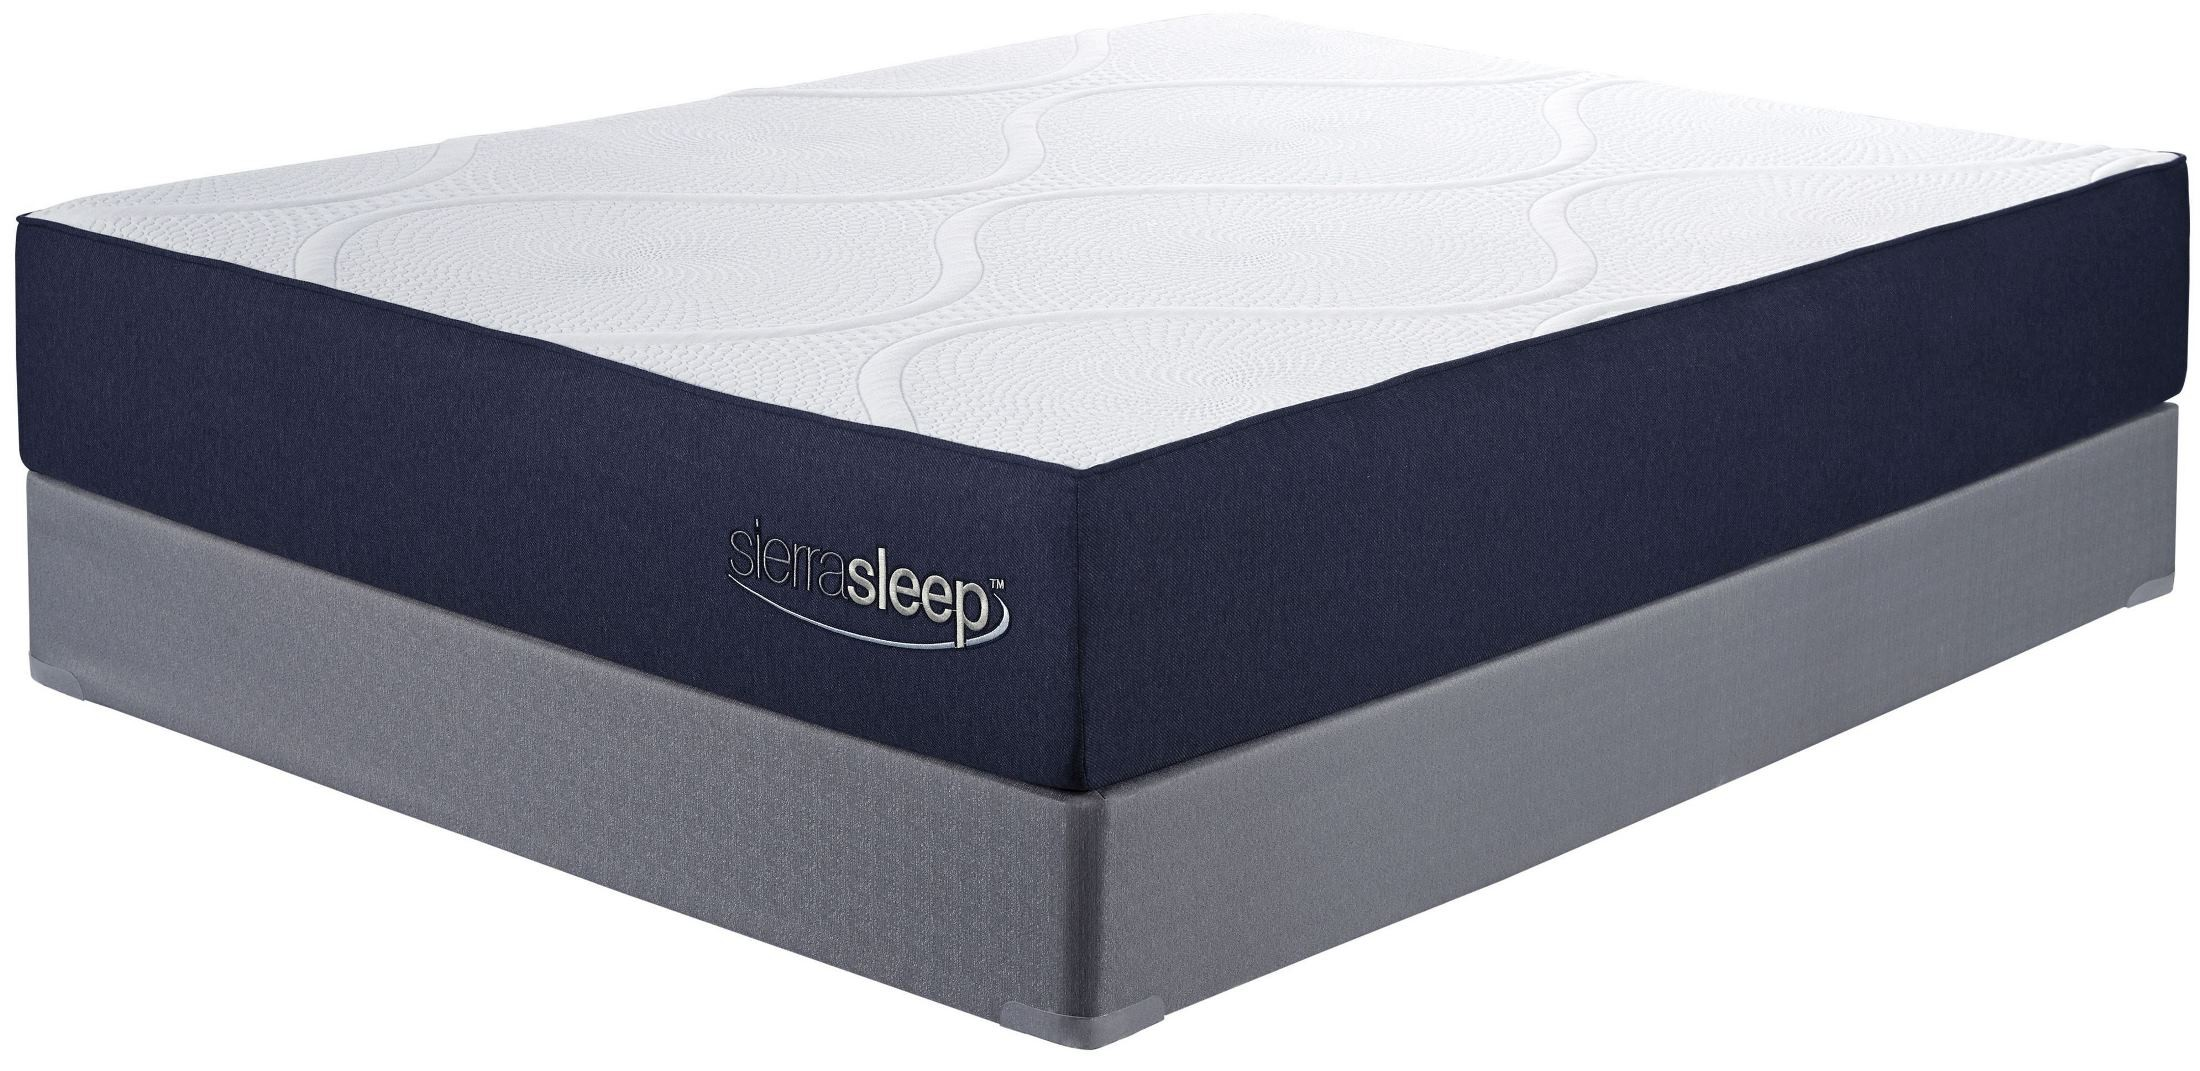 11 Inch Gel Memory Foam White Queen Mattress From Ashley M97331 Coleman Furniture